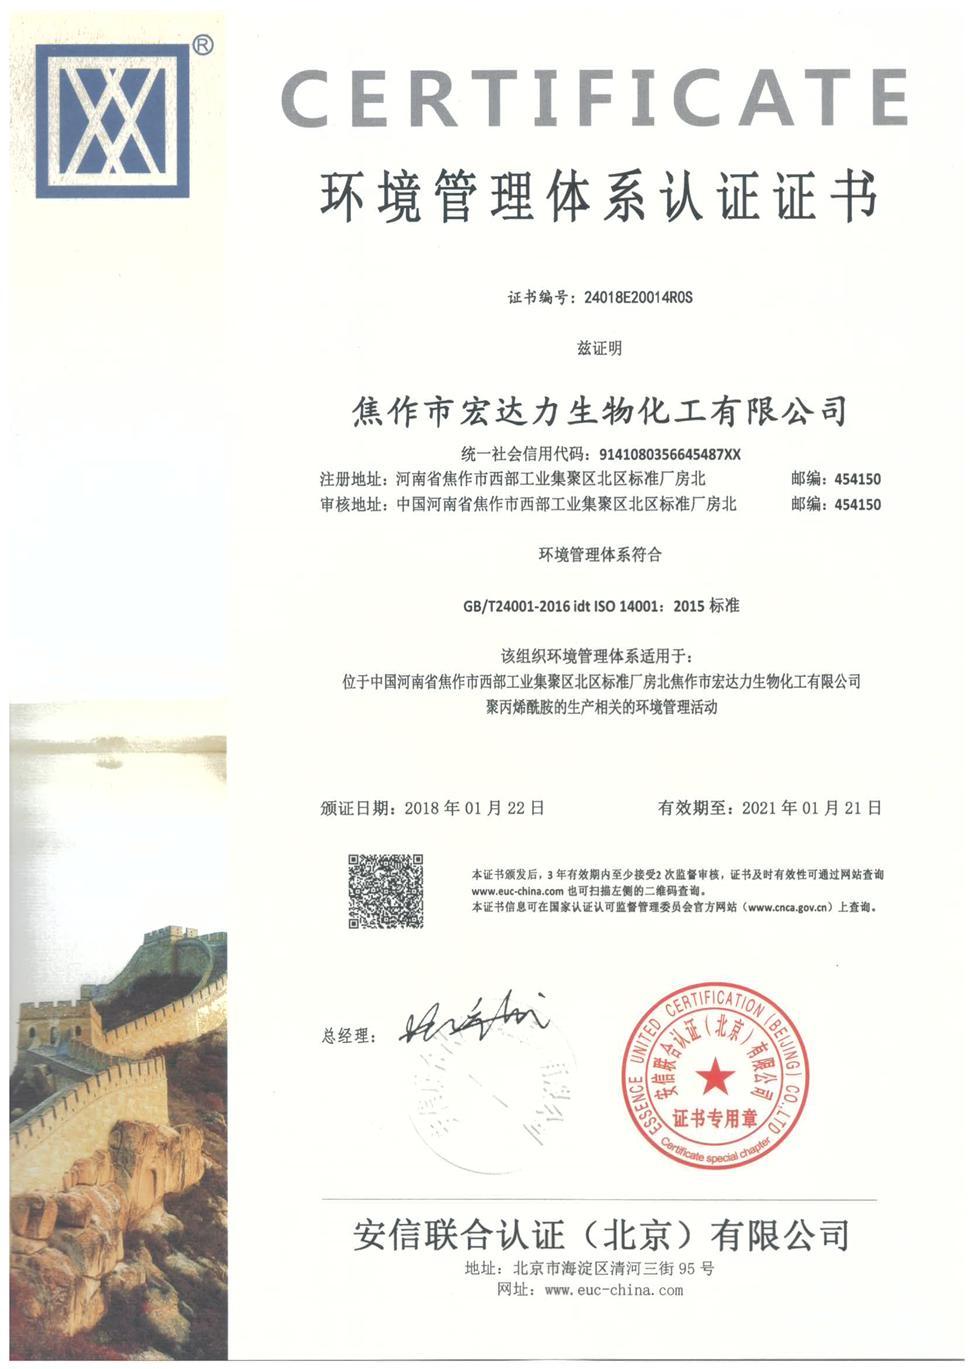 Environmental management system certification